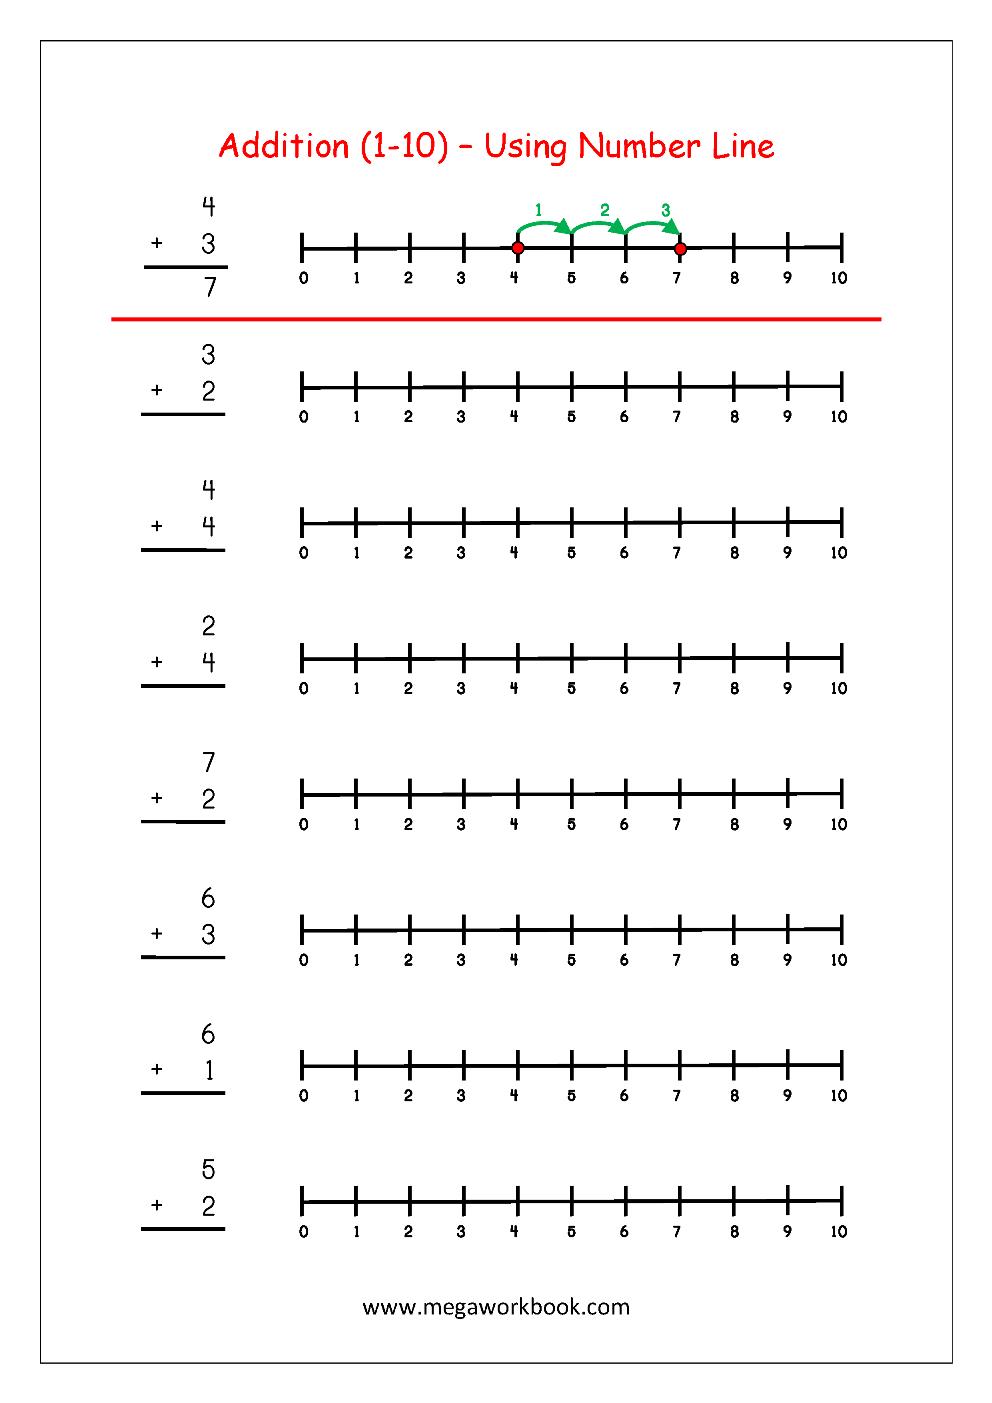 Free Printable Number Addition Worksheets (1-10) For Kindergarten | Free Printable Addition Worksheets For Grade 1